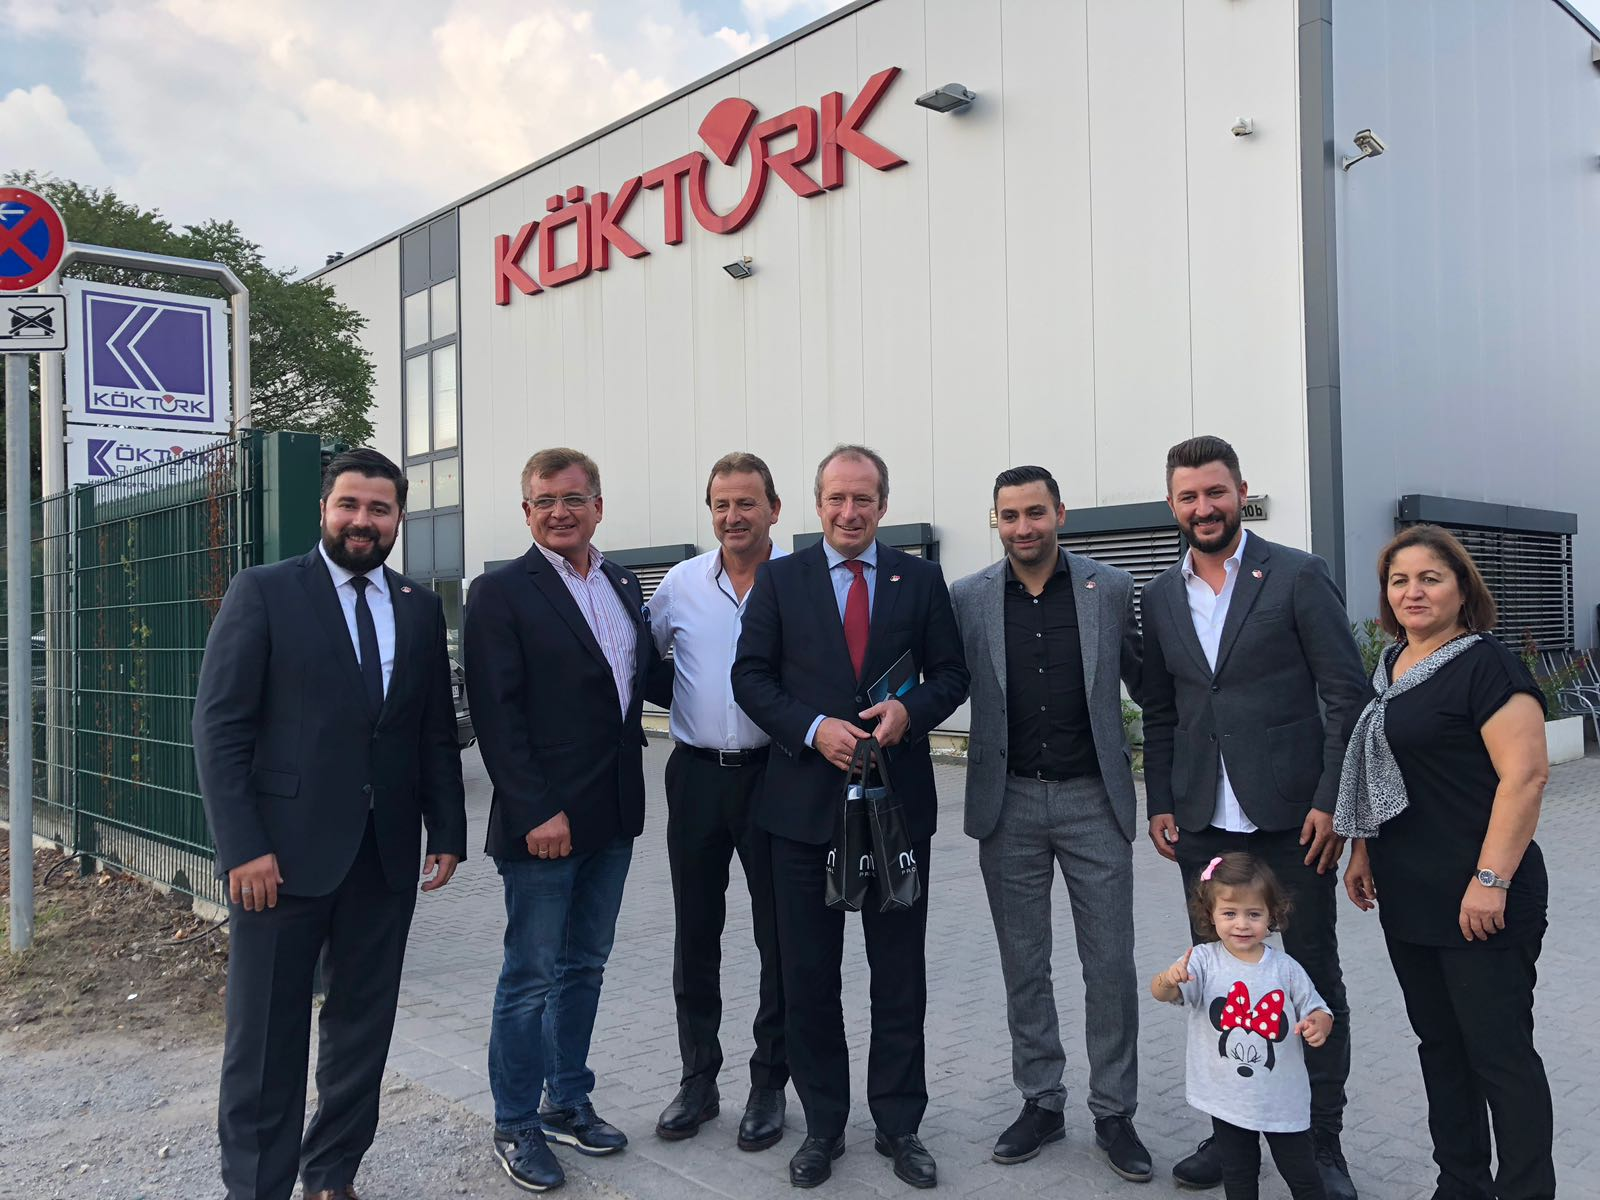 Alman Vekilden Türk Esnaflara Övgü